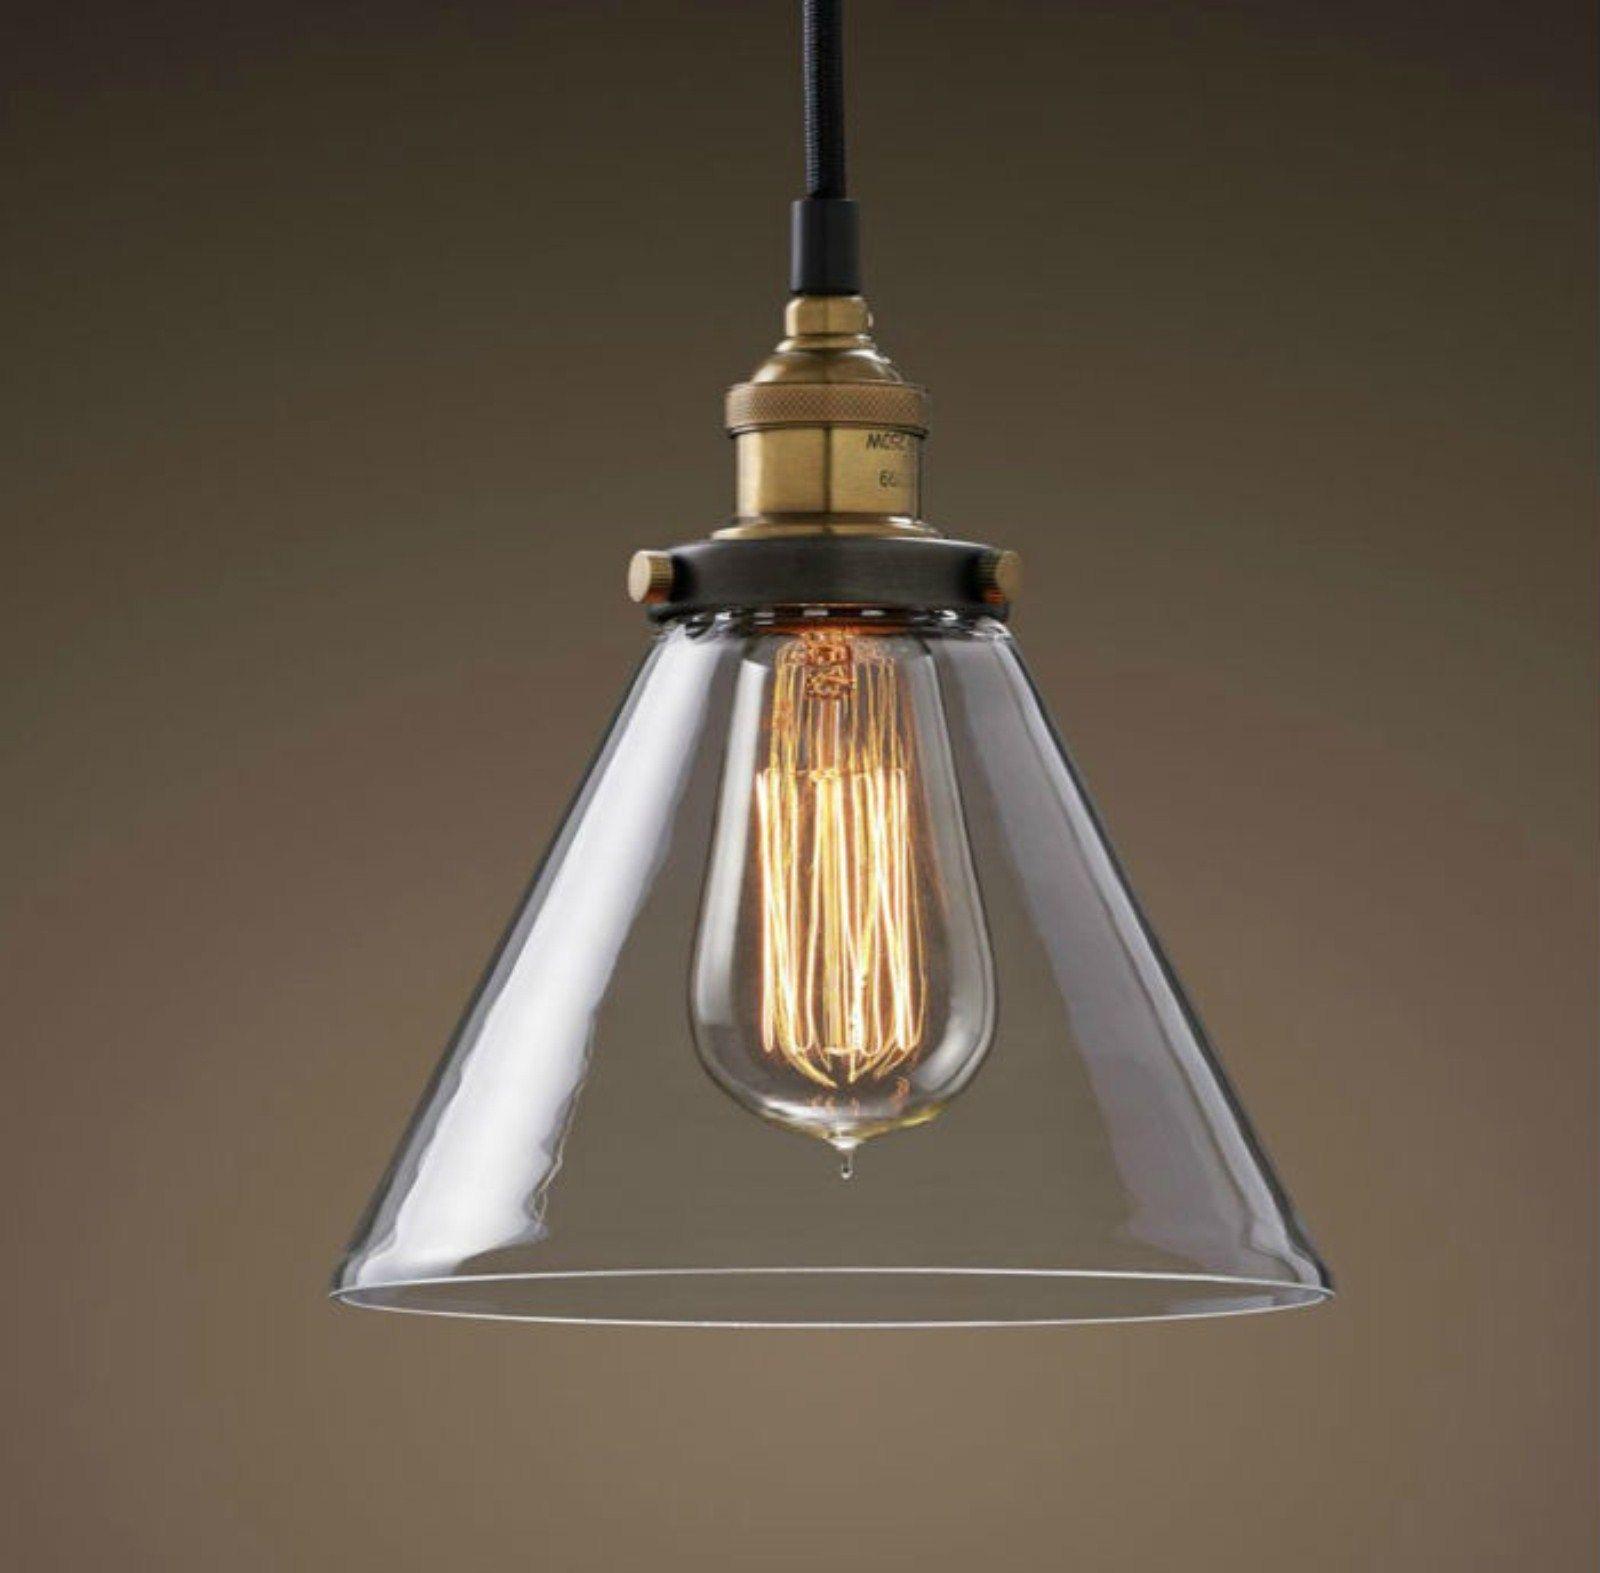 Furniture Antique Glass Pendant Lights For Low Ceilings Halogen